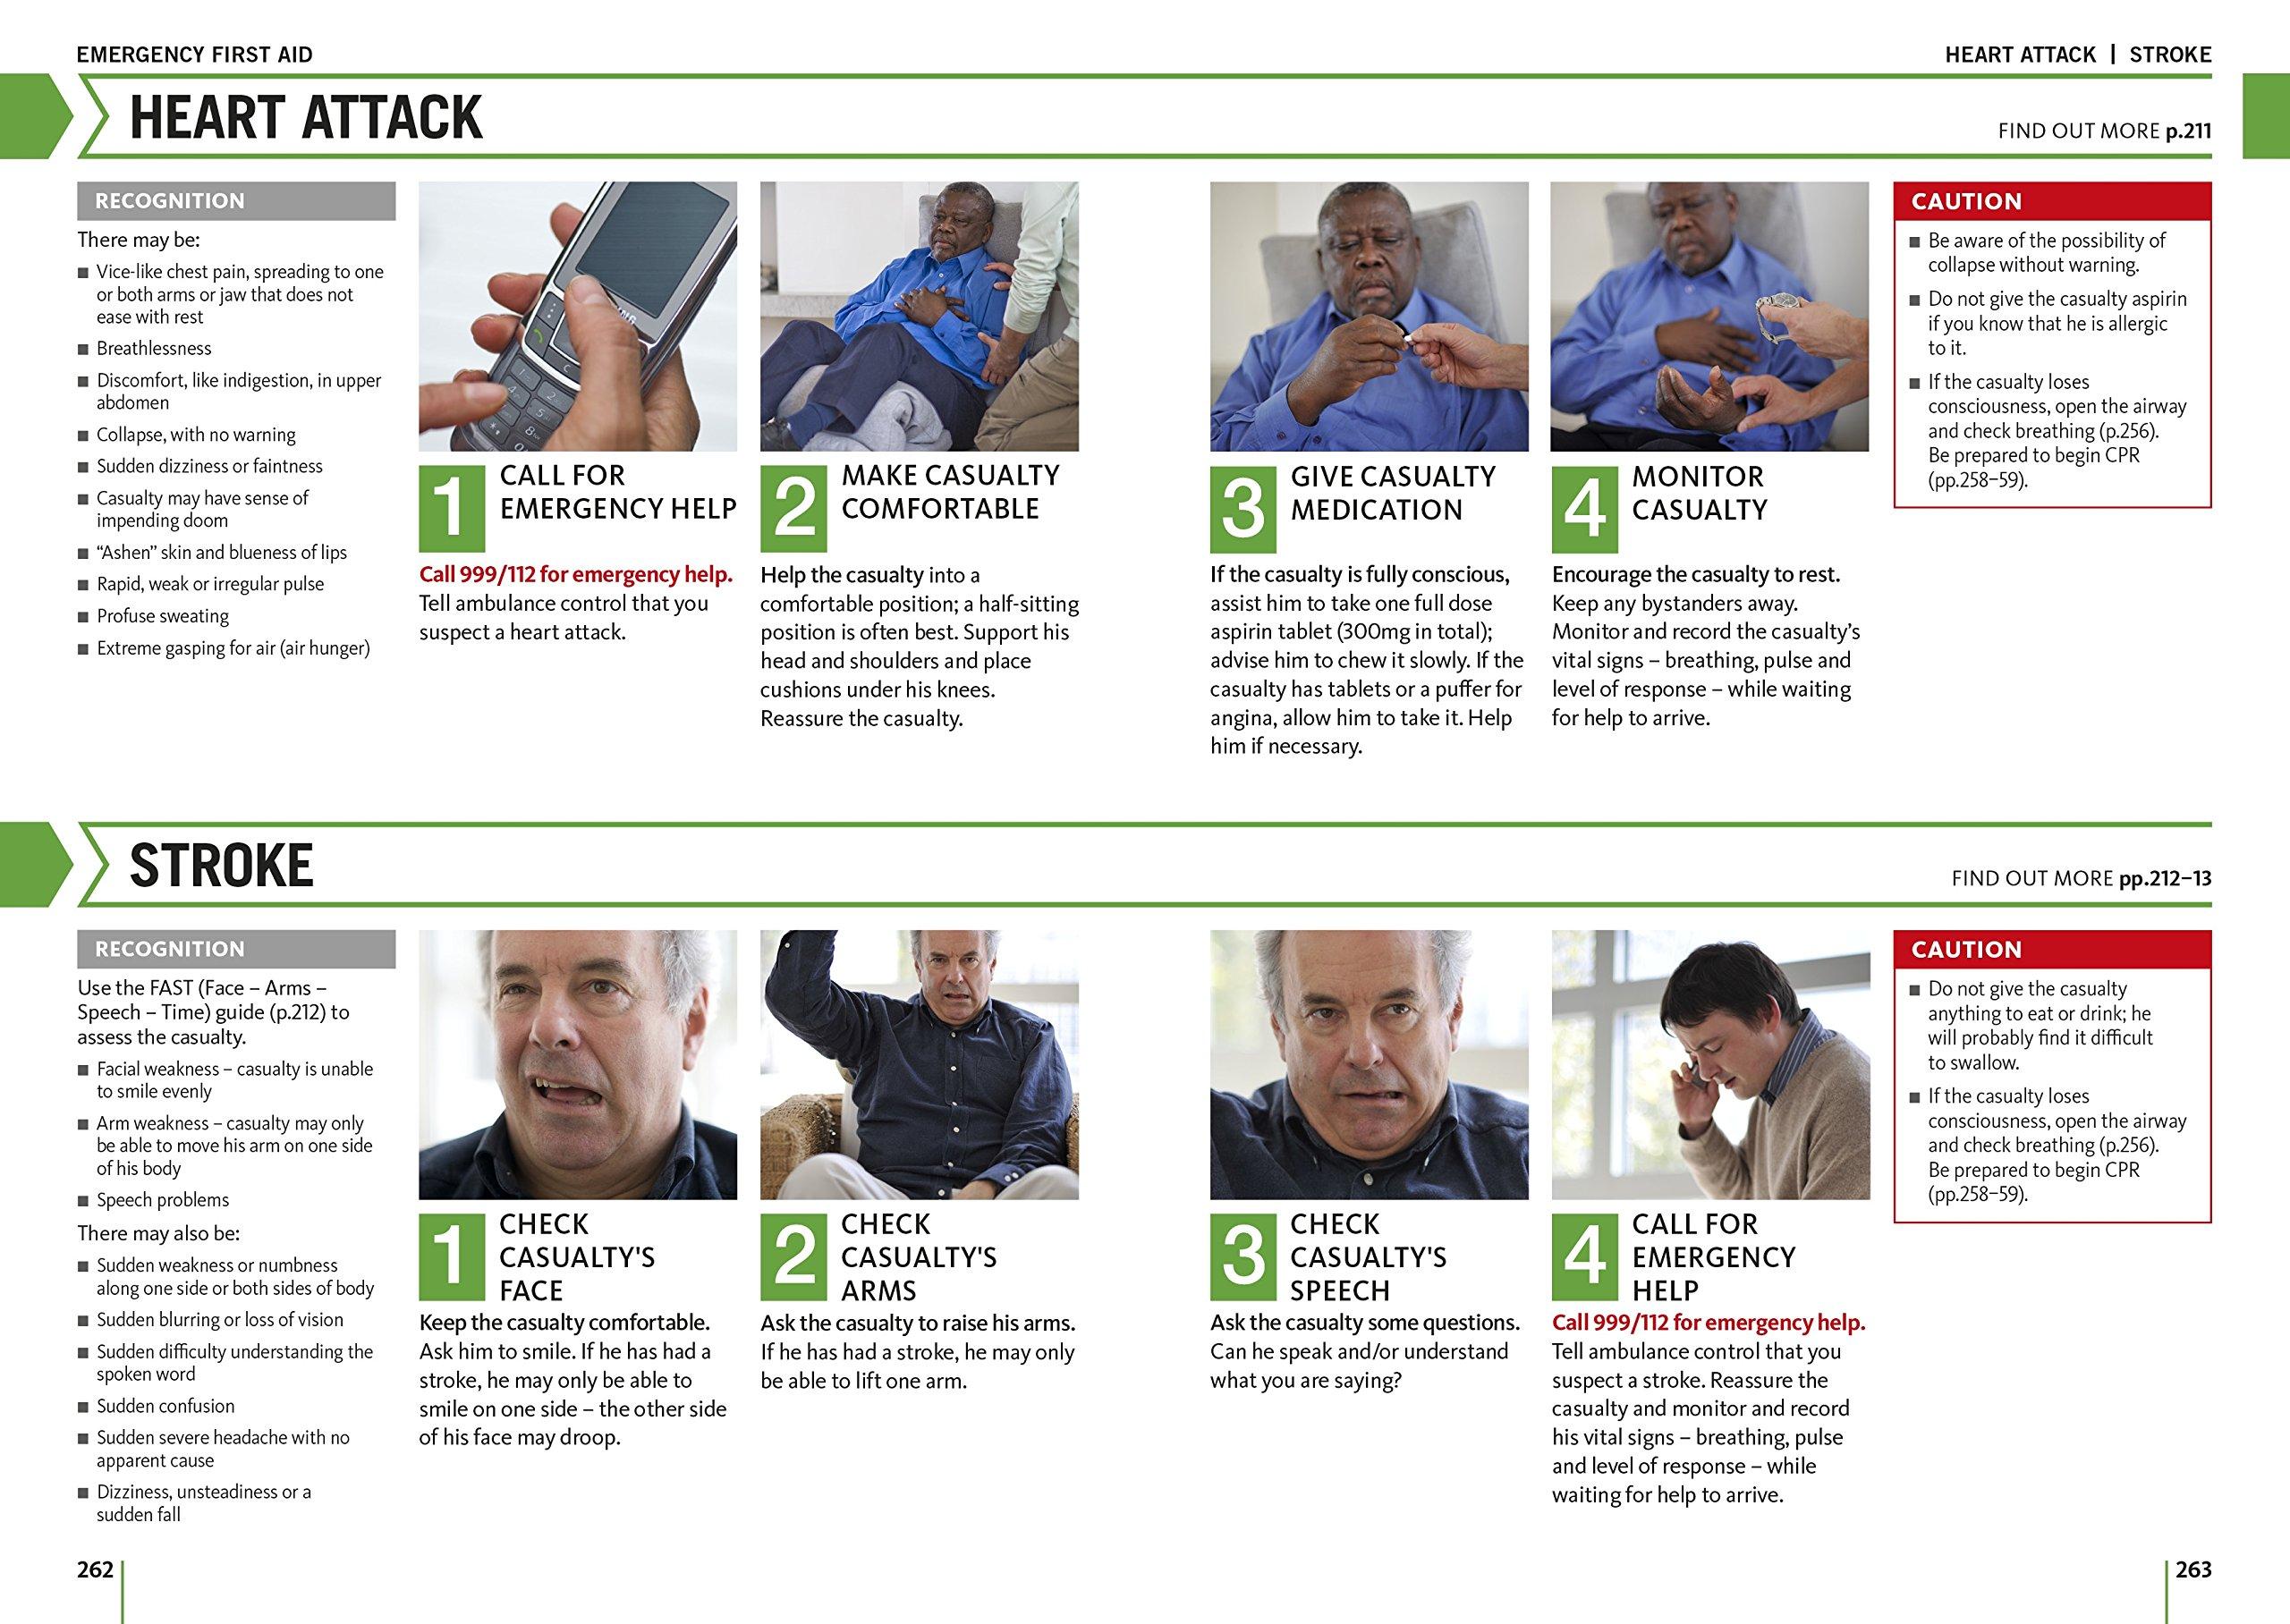 first aid manual dk 9781409342007 amazon com books rh amazon com first aid manual - revised 10th edition 2016 pdf first aid manual 10th edition revised